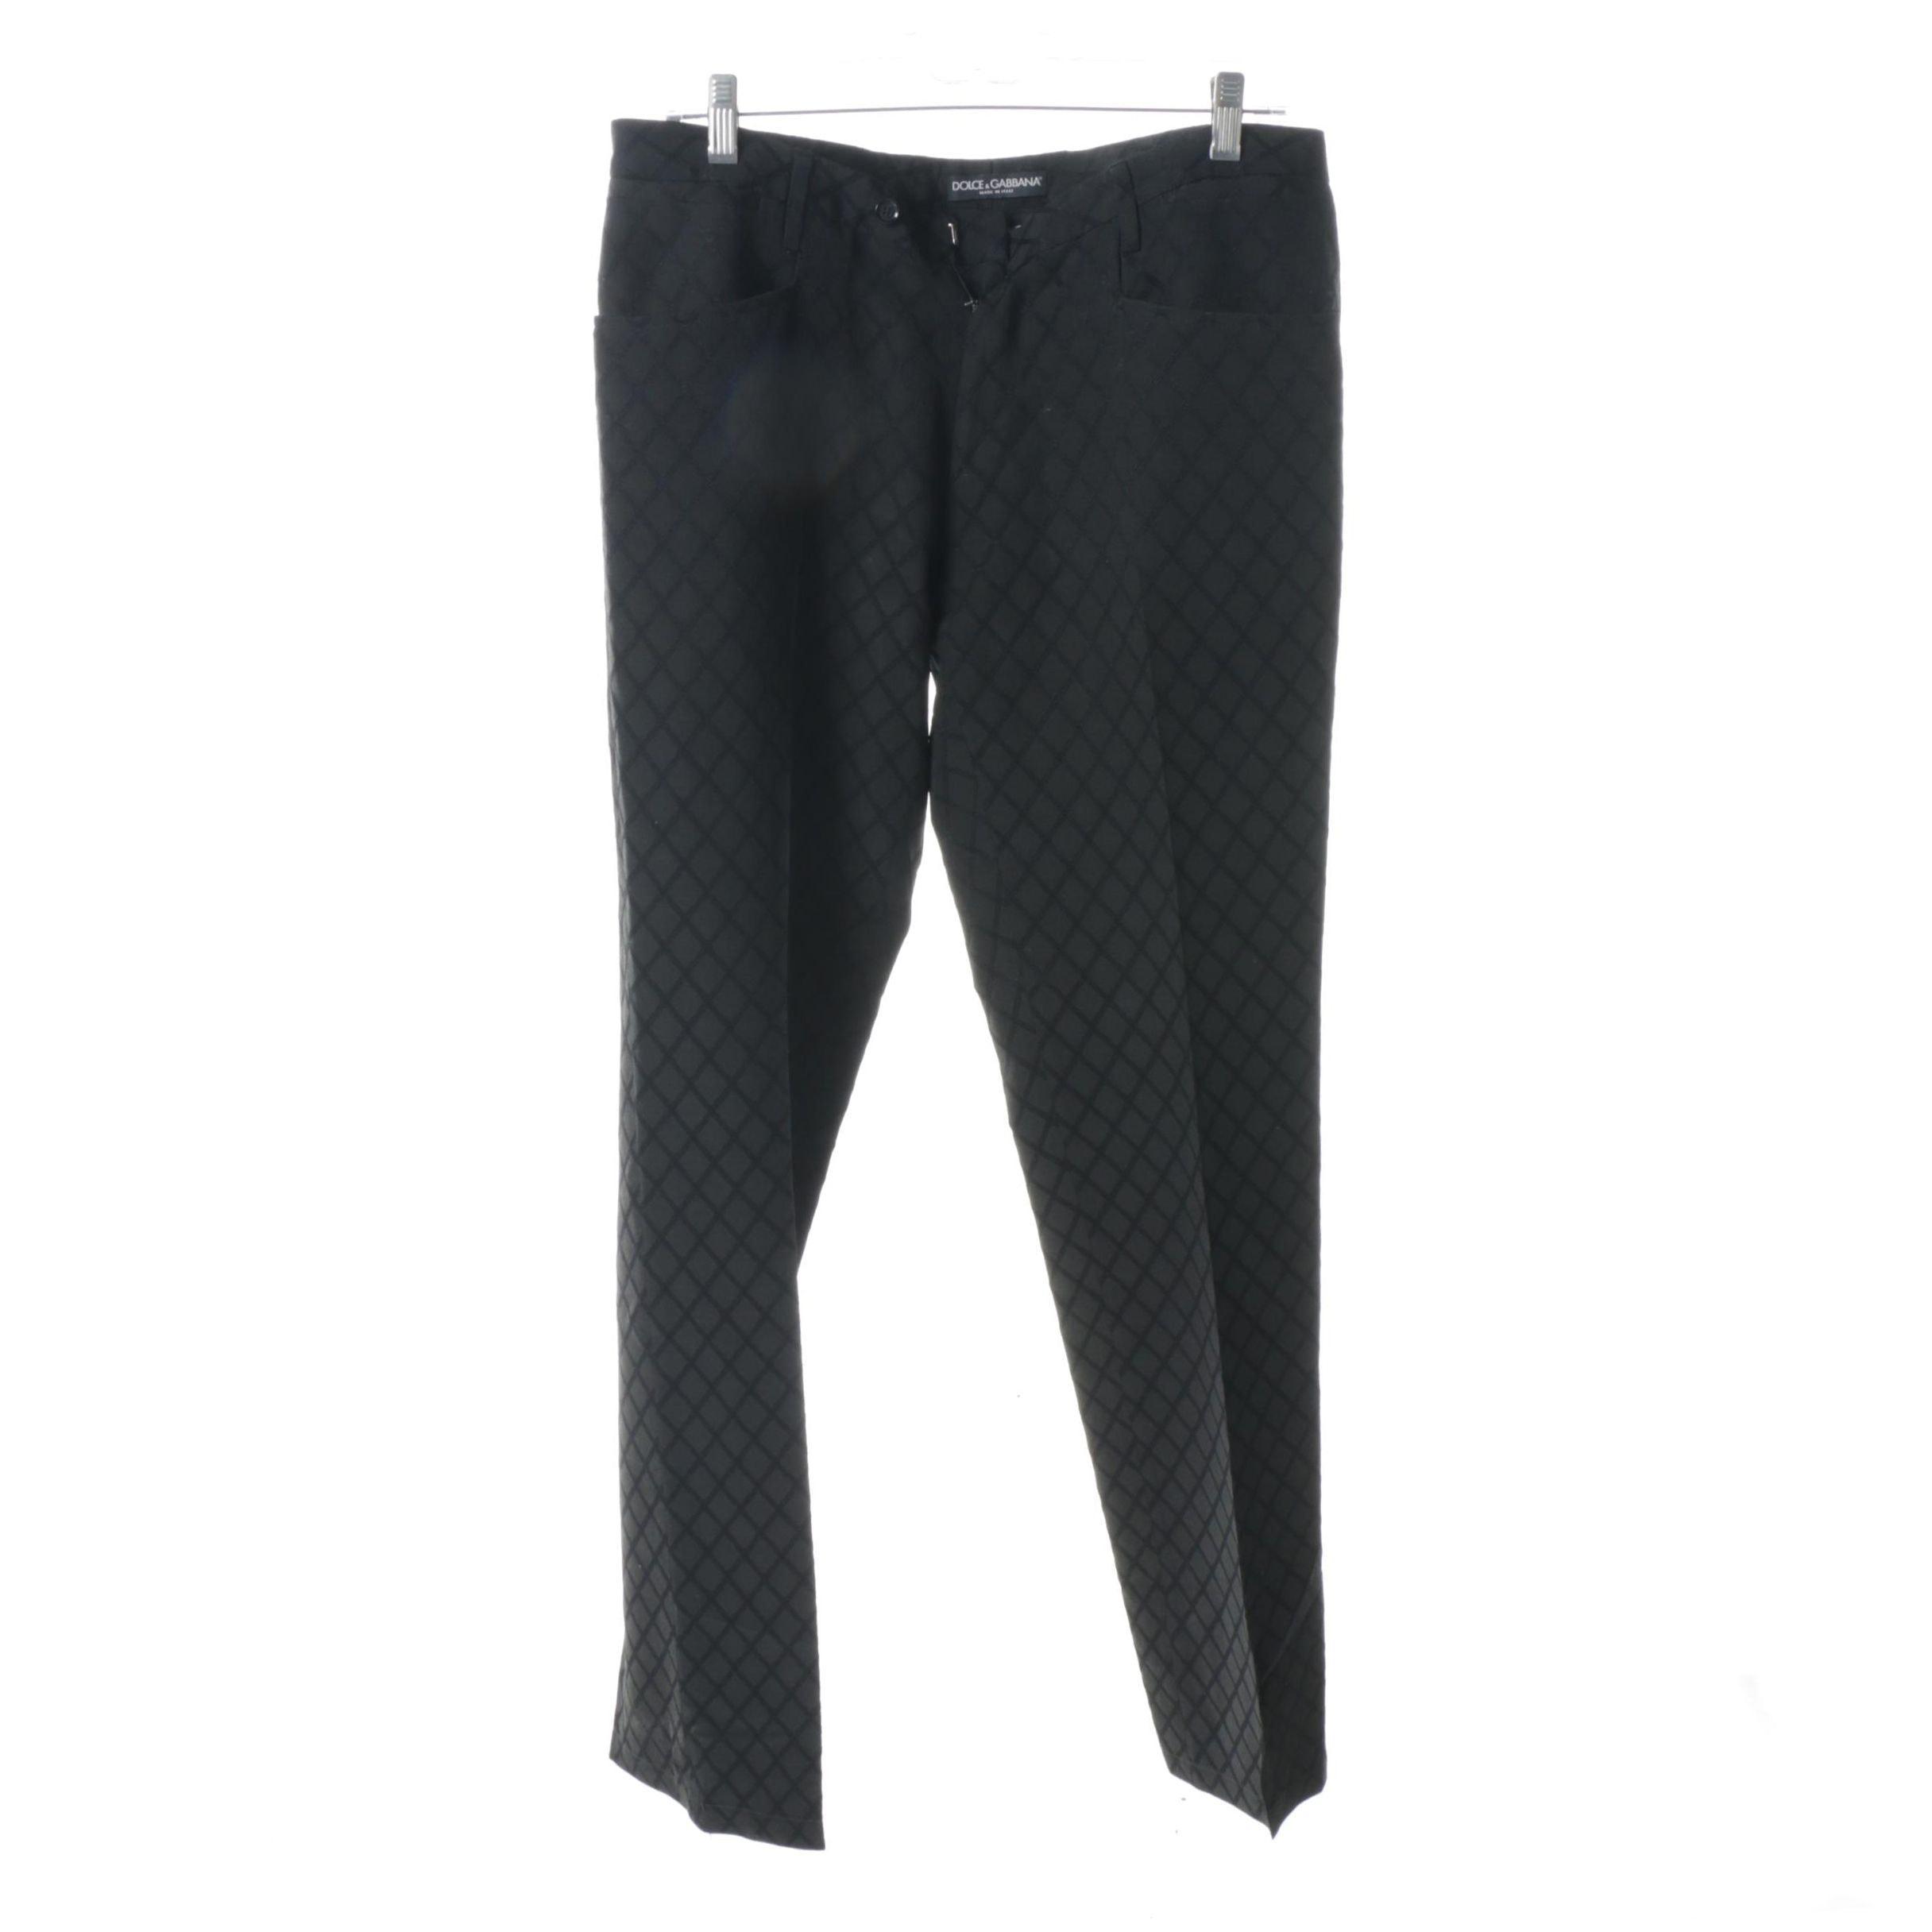 Men's Dolce & Gabbana Wool and Silk Blend Jacquard Trousers